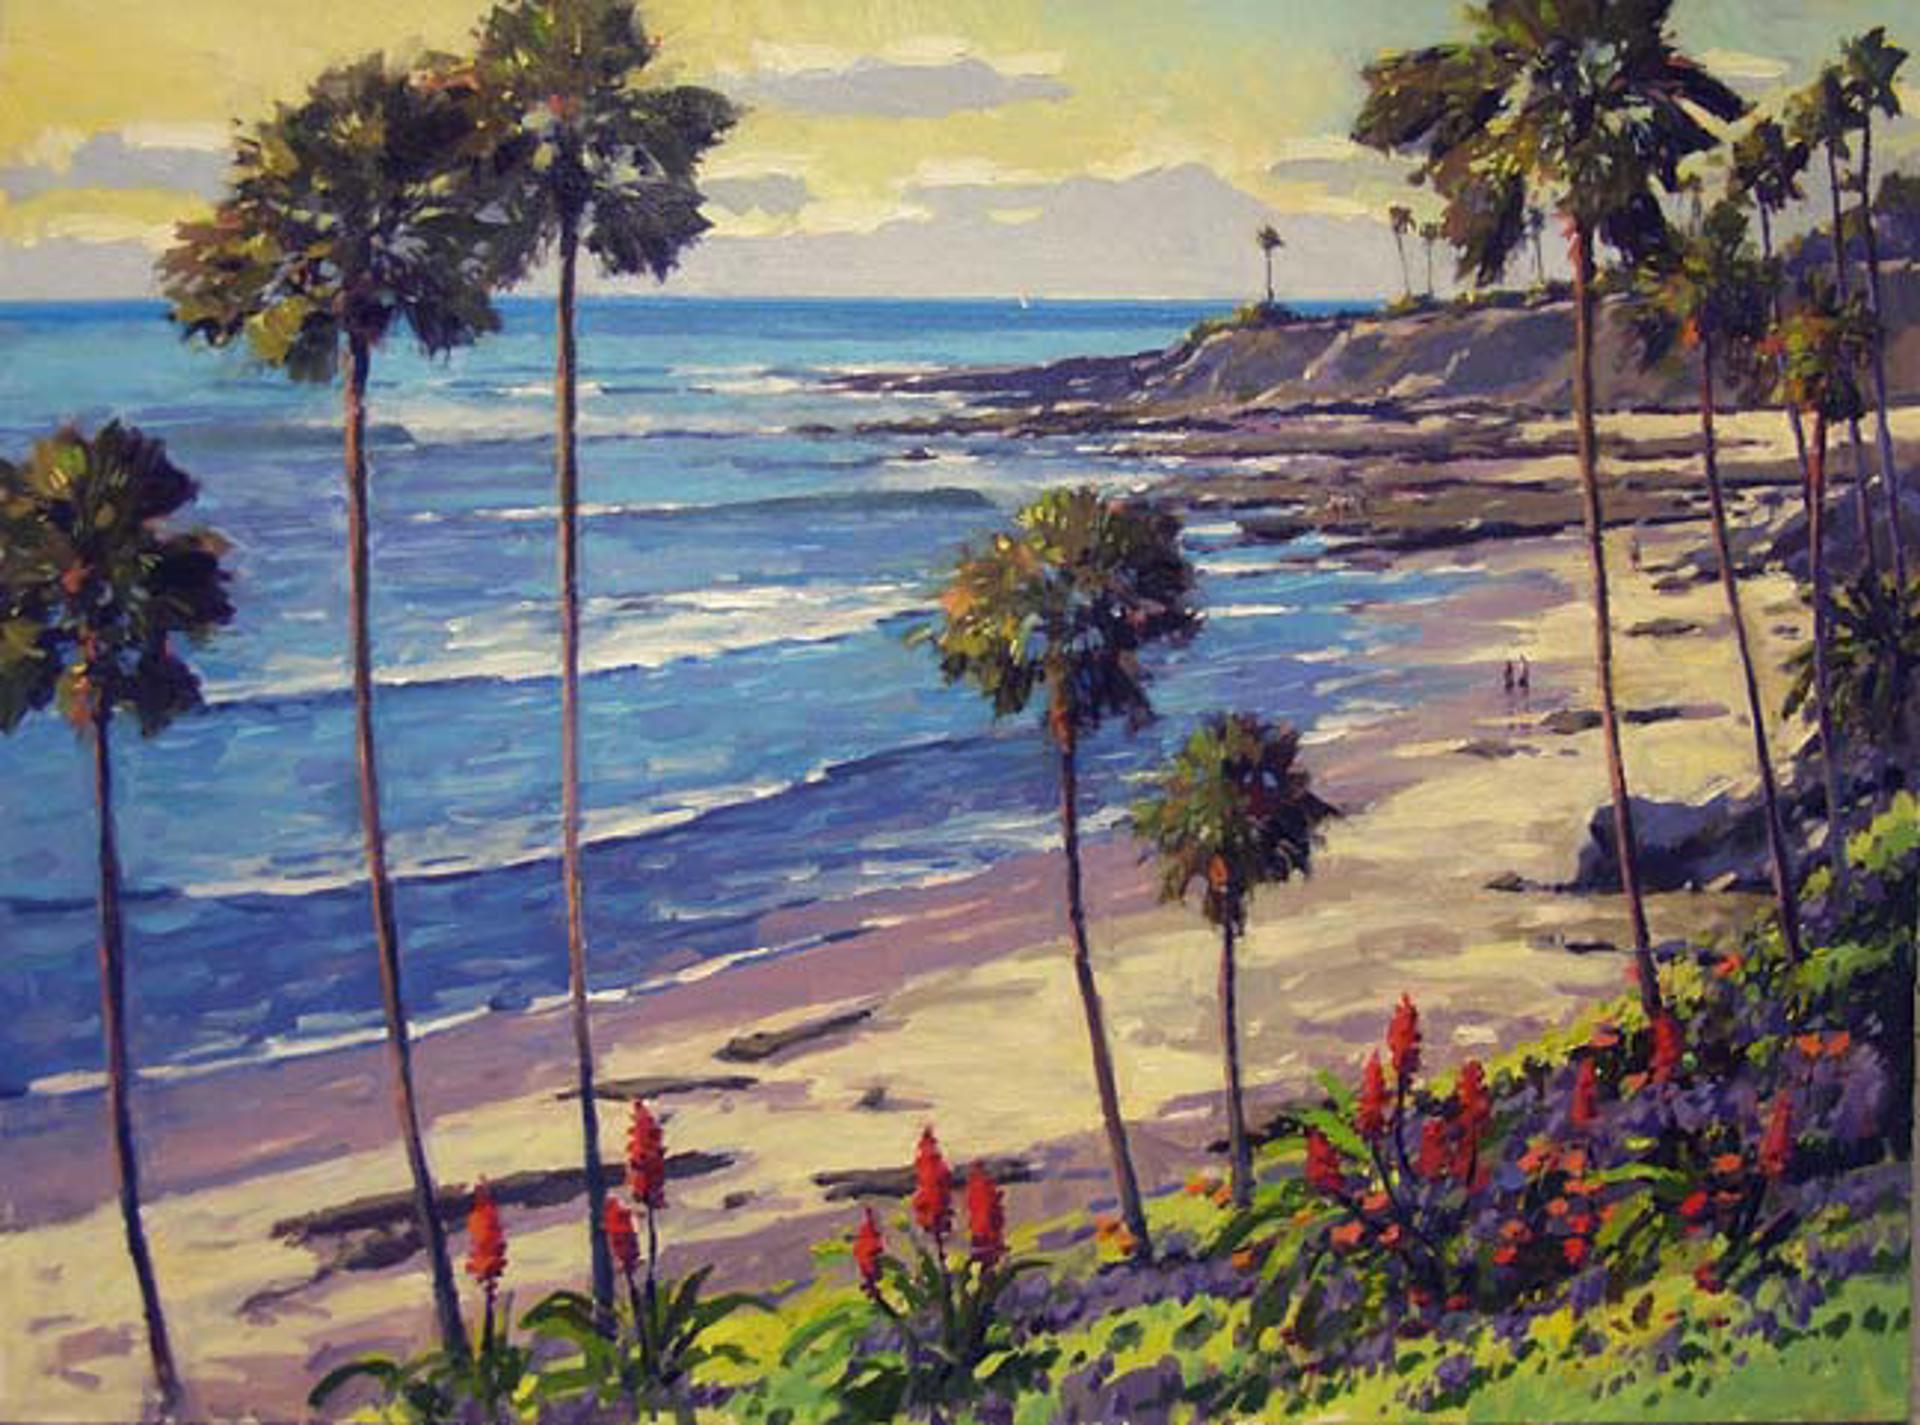 Laguna Sunshine by Ronaldo Macedo